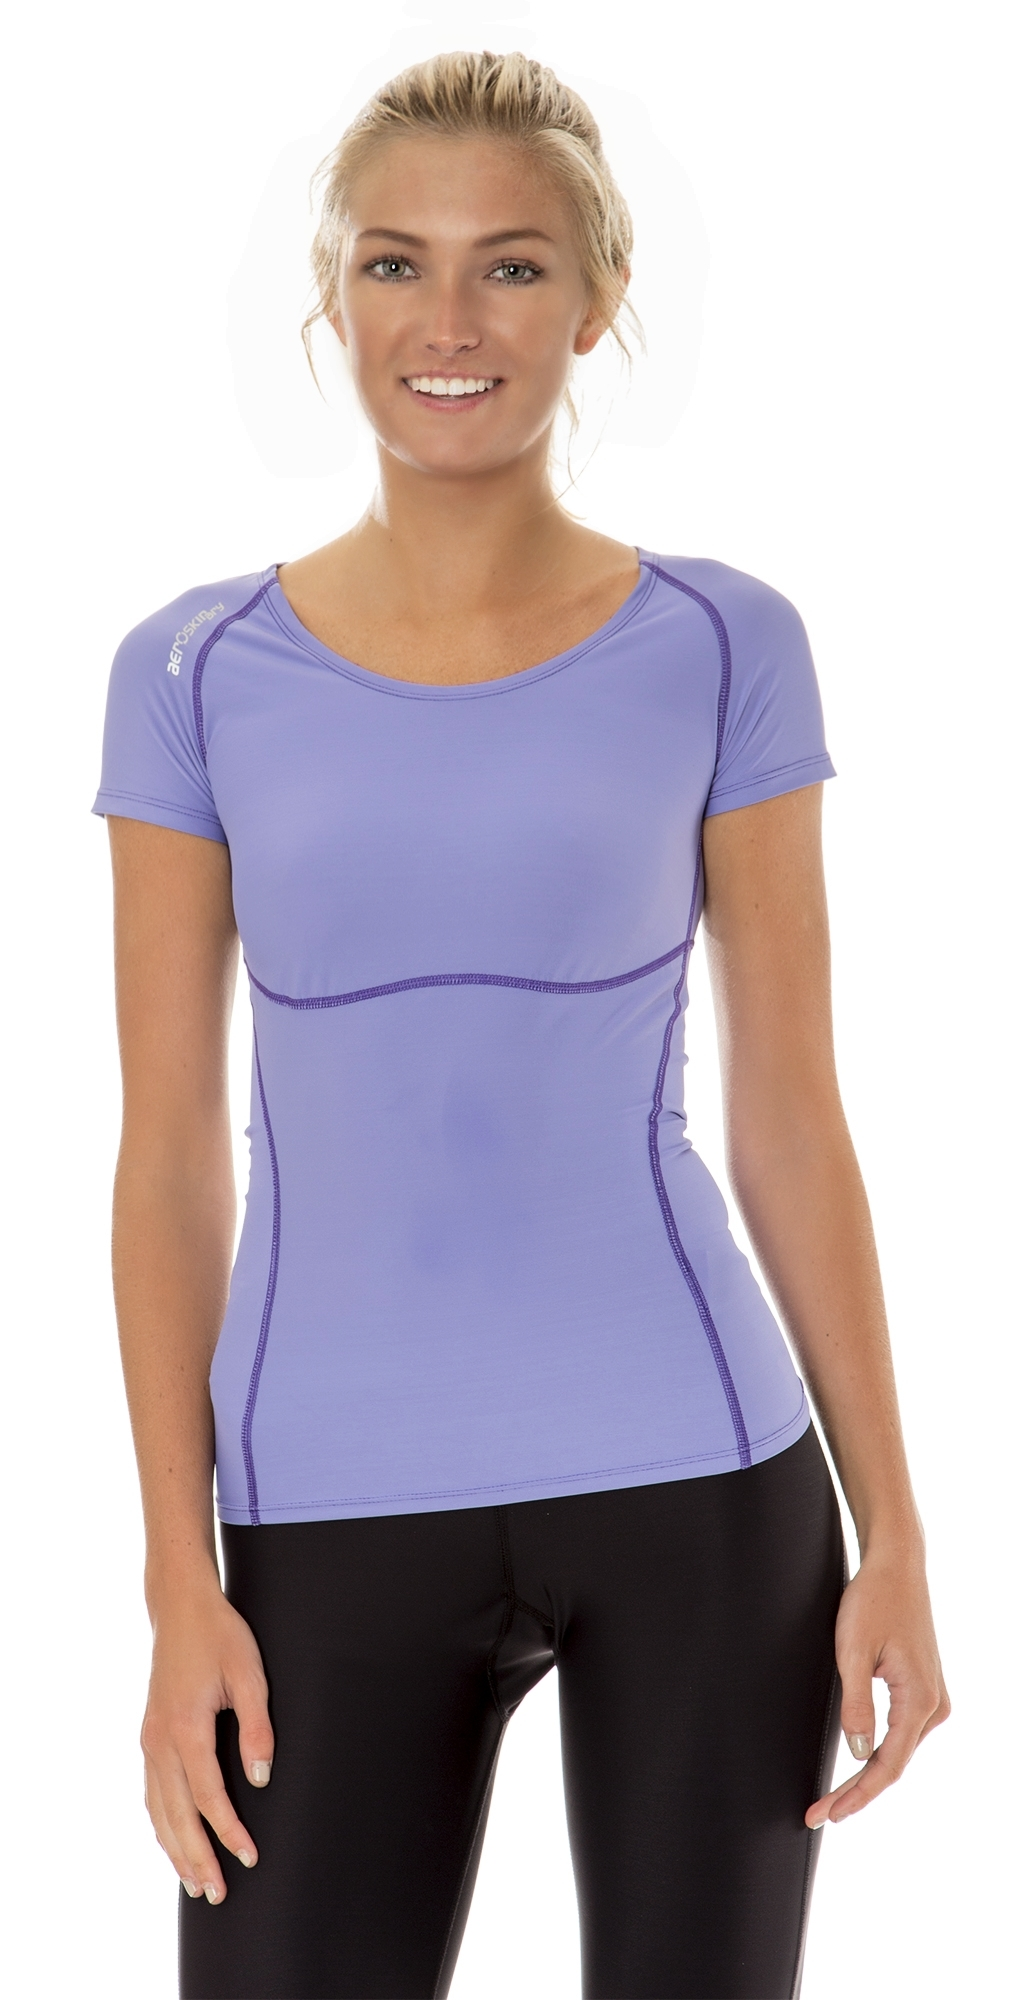 Aeroskin dry womens compression short sleeve running shirt for Long sleeve running shirt womens